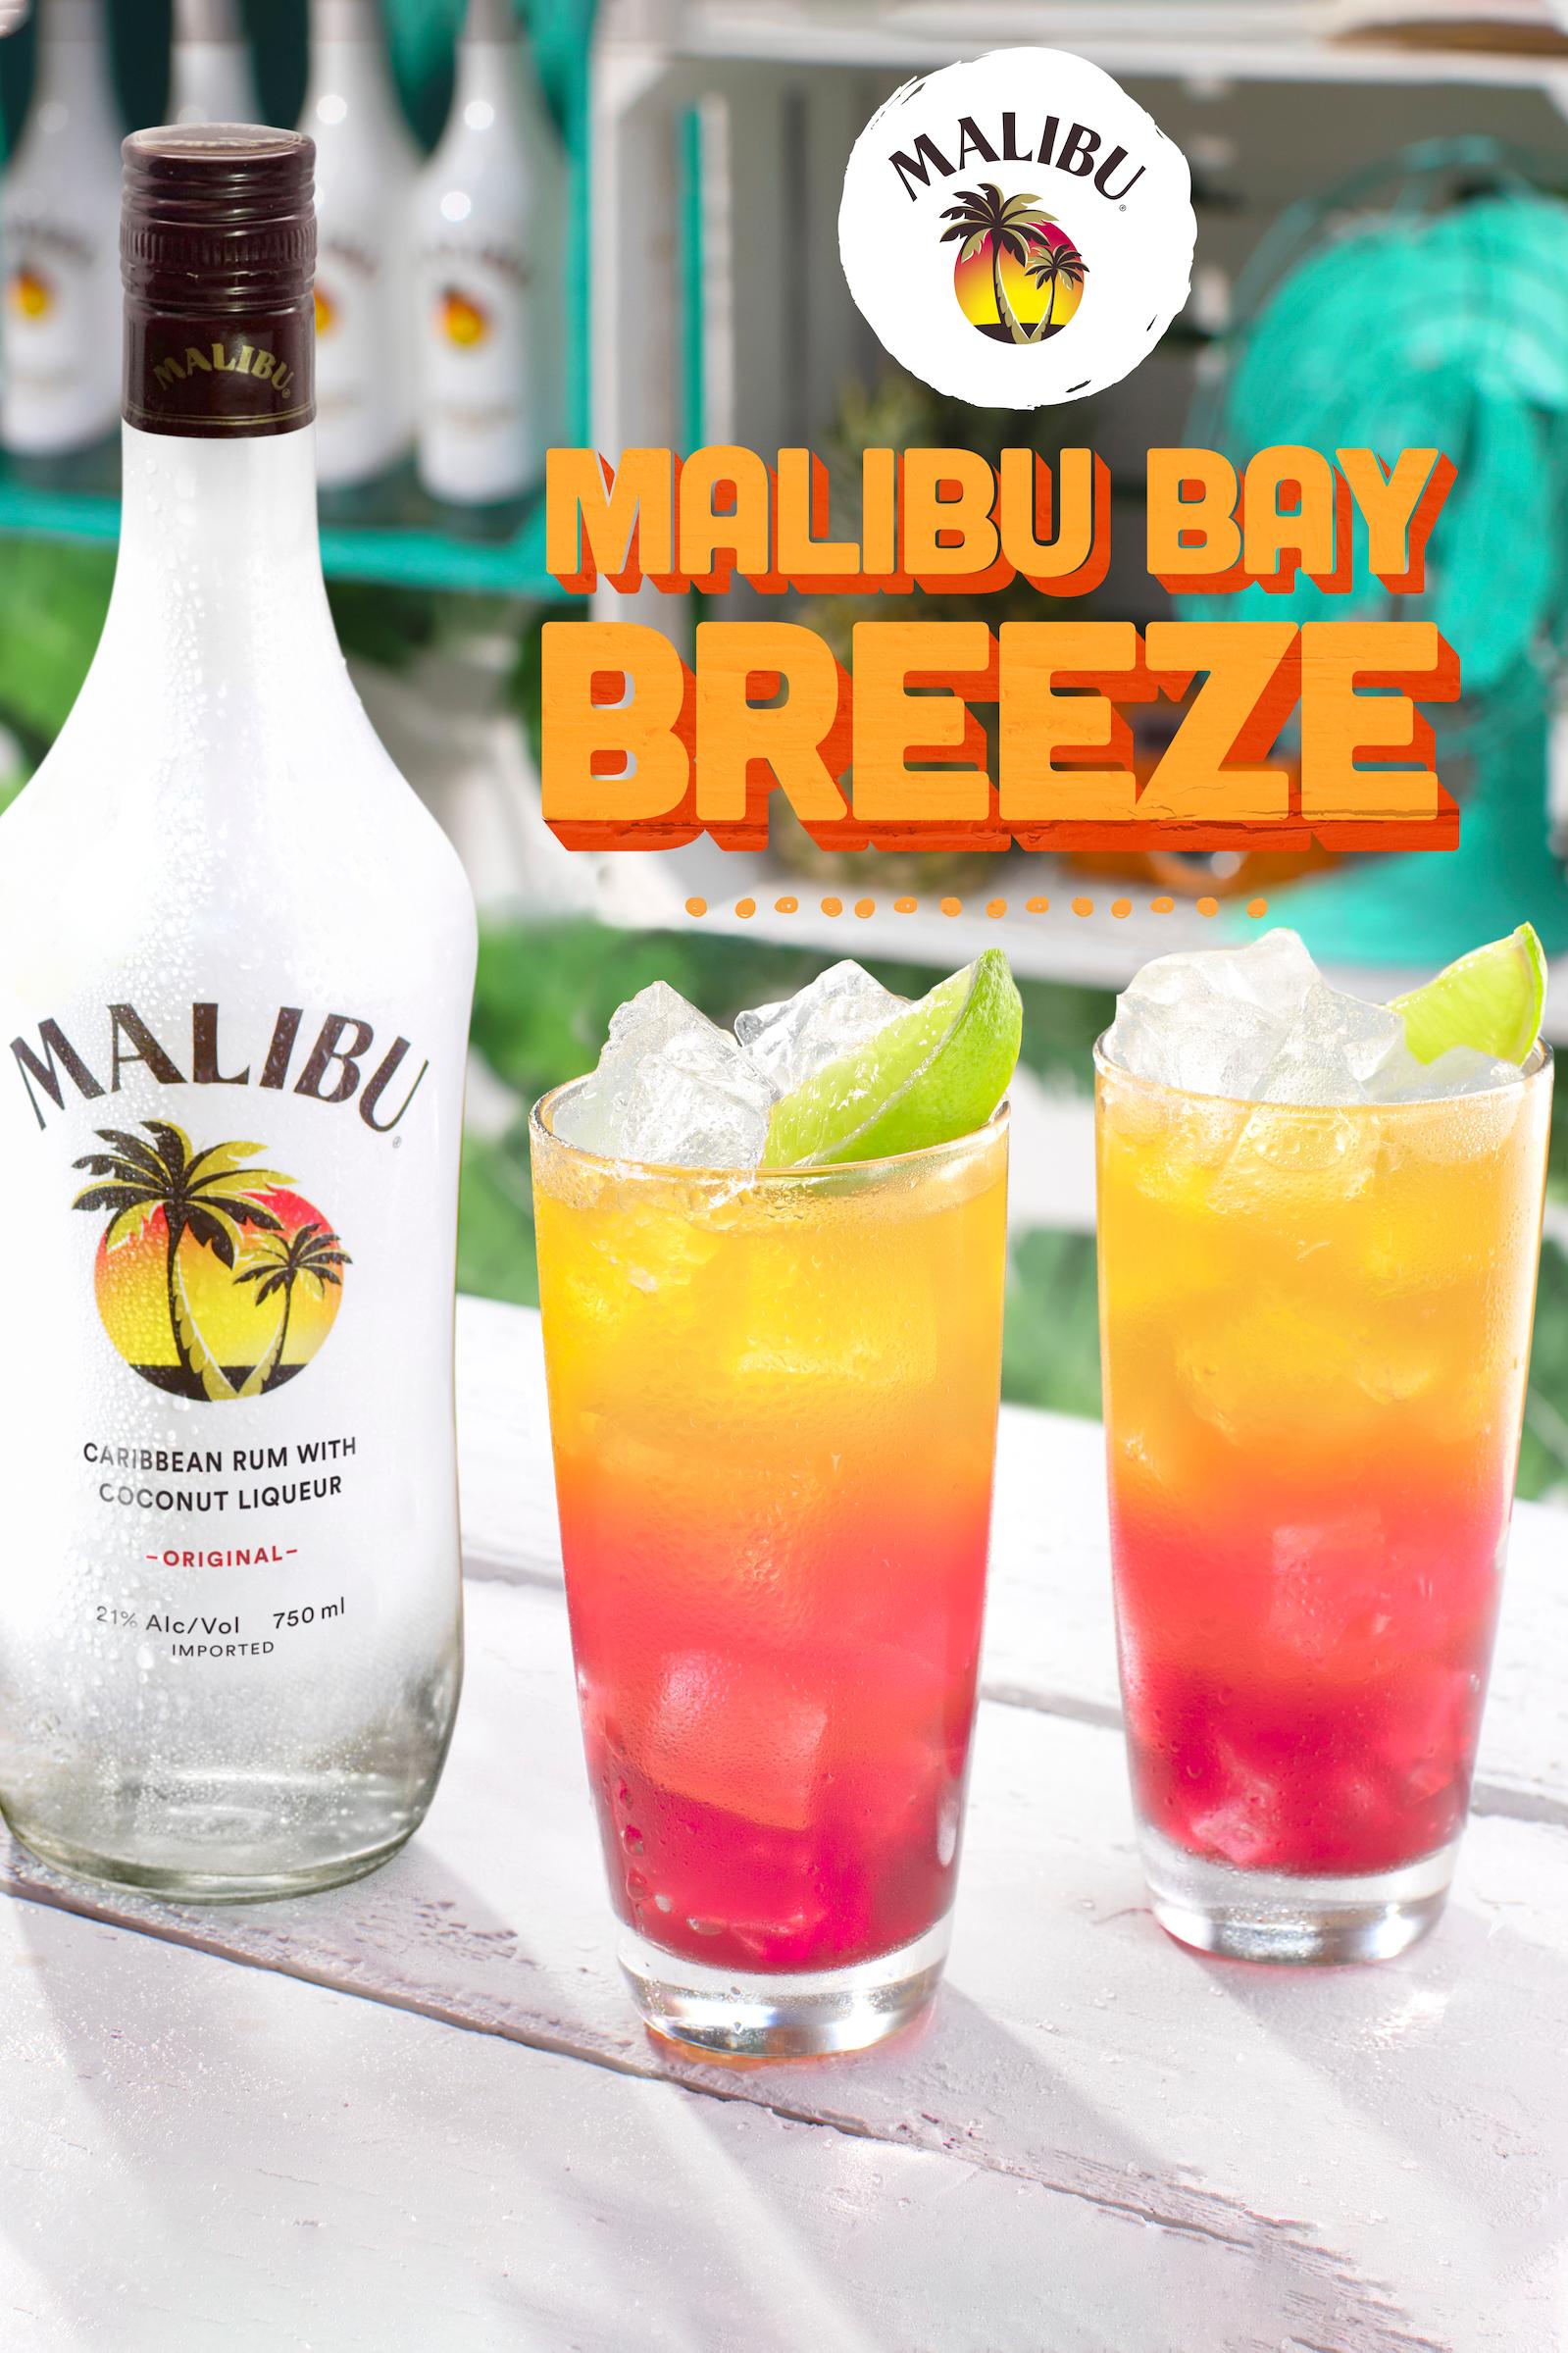 Malibu Bay Brise